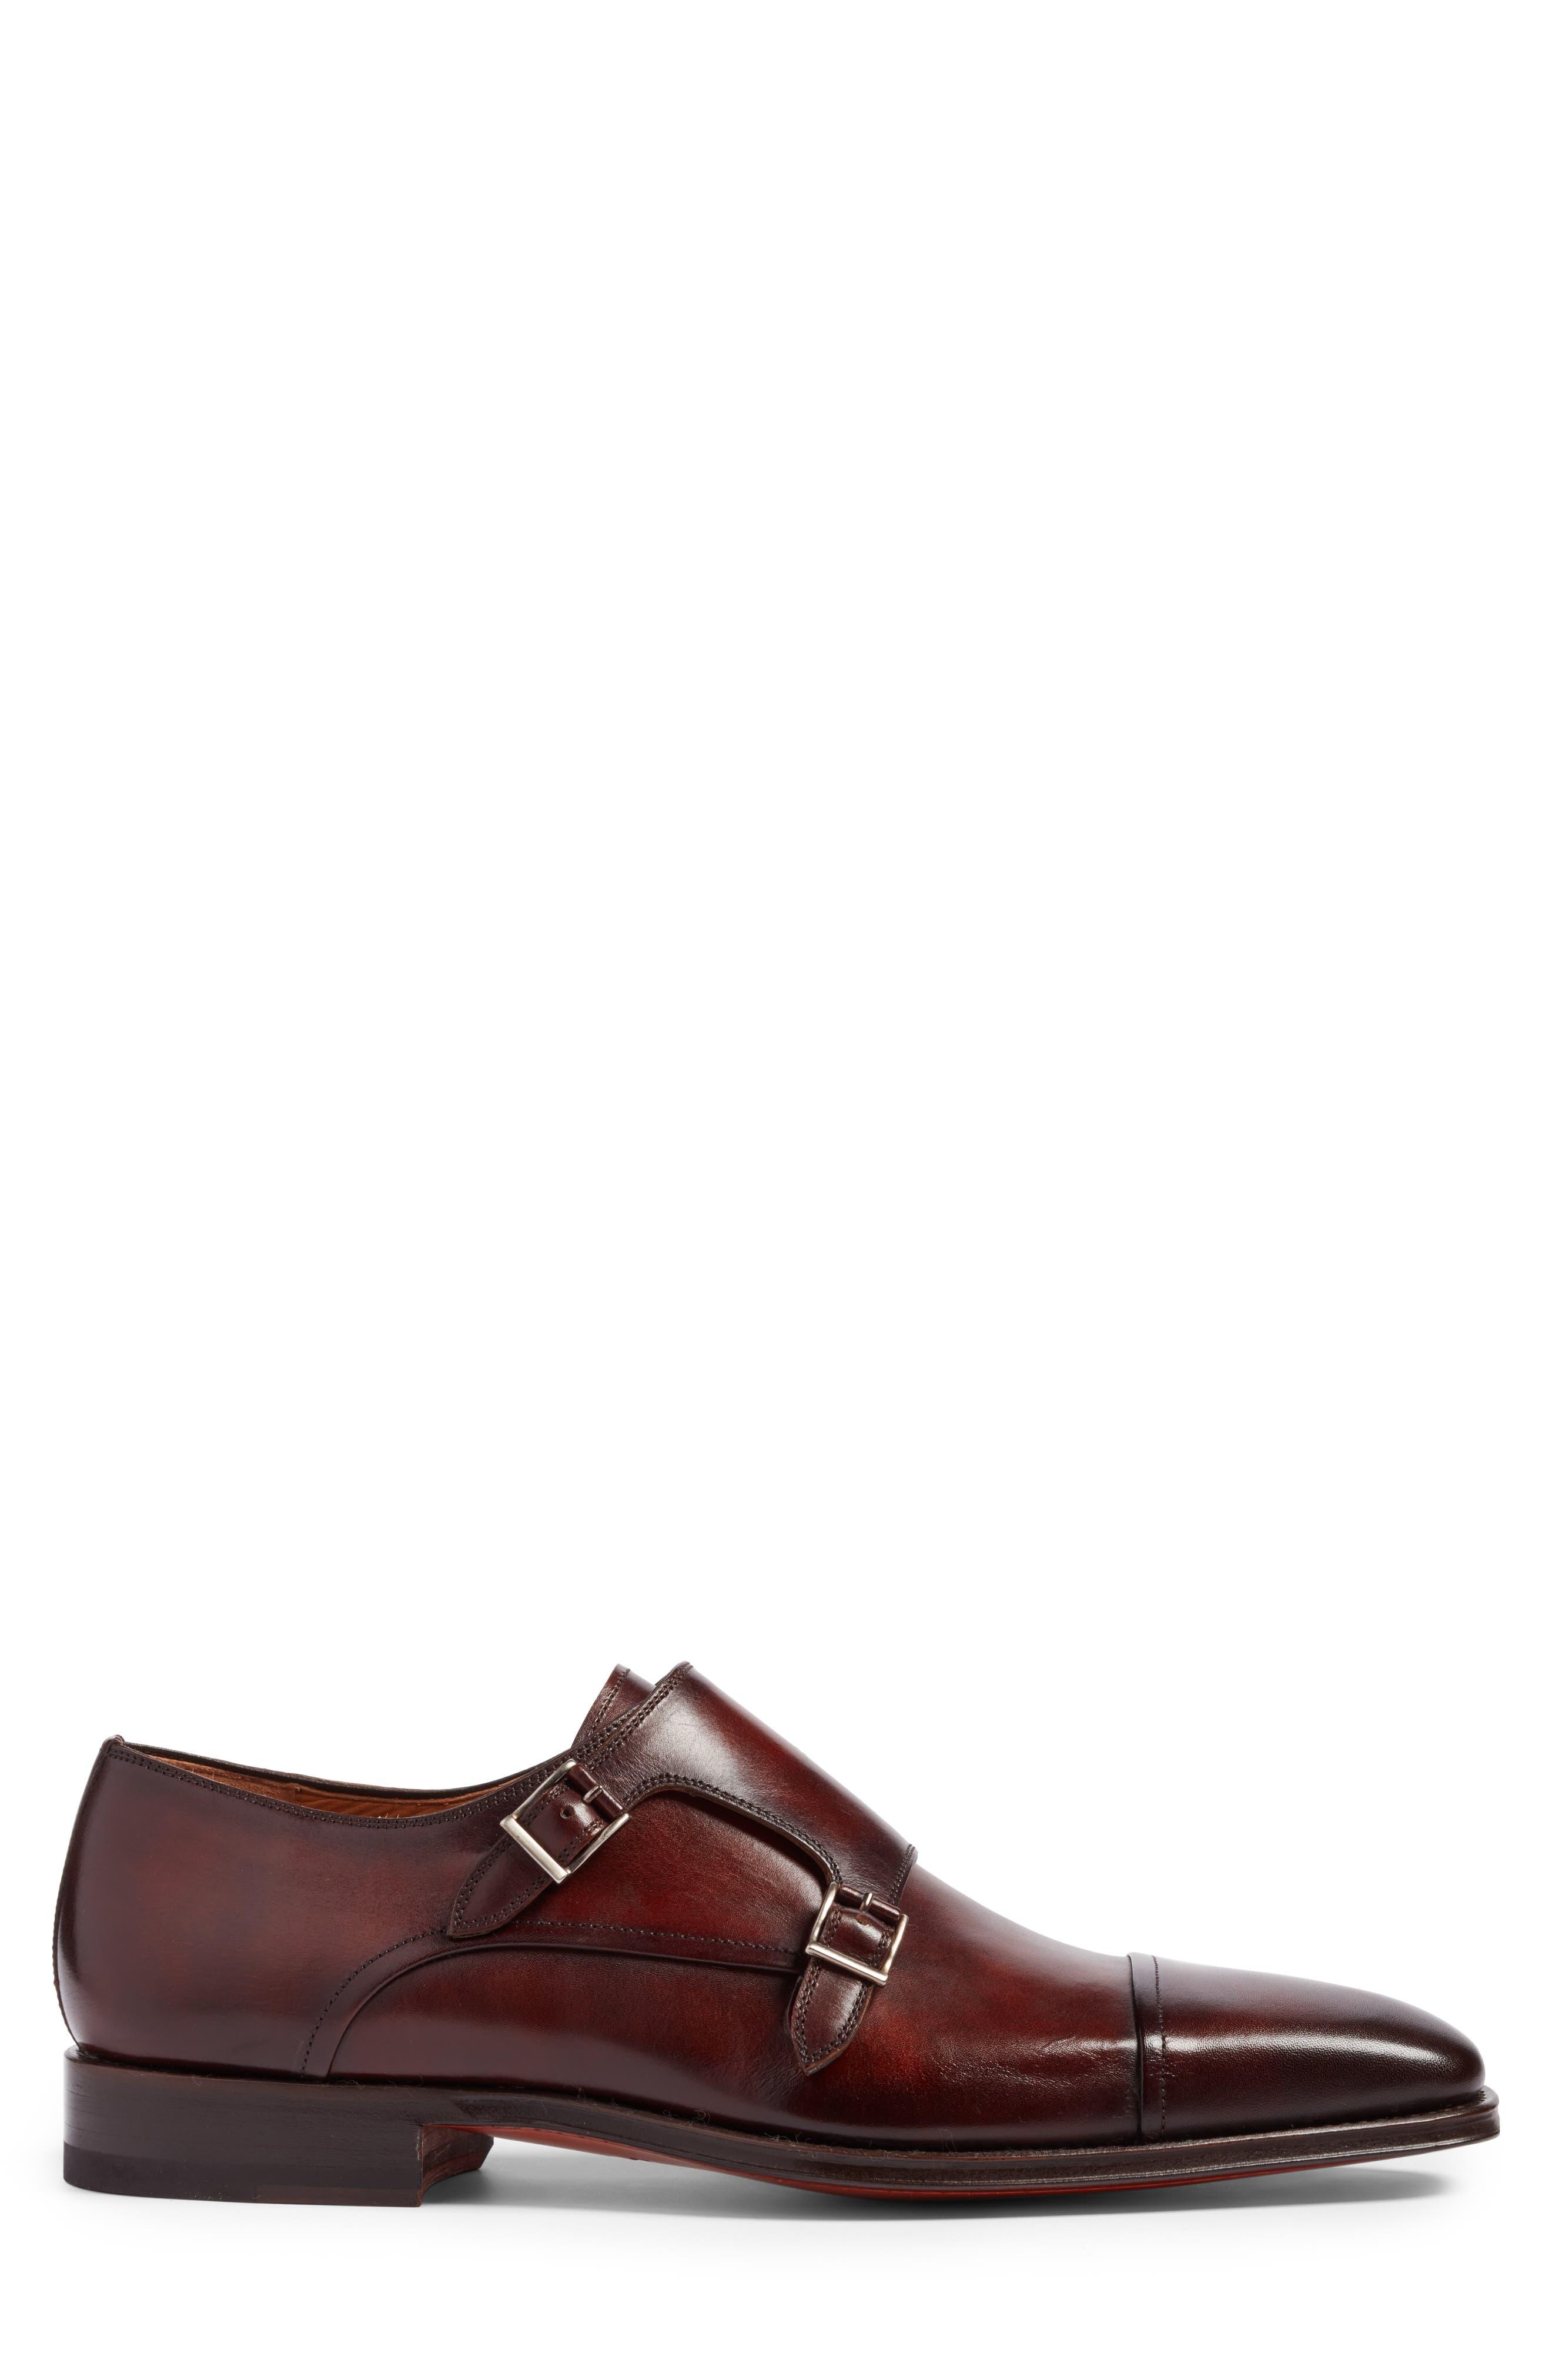 Alternate Image 3  - Magnanni Silvio Double Monk Strap Shoe (Men)